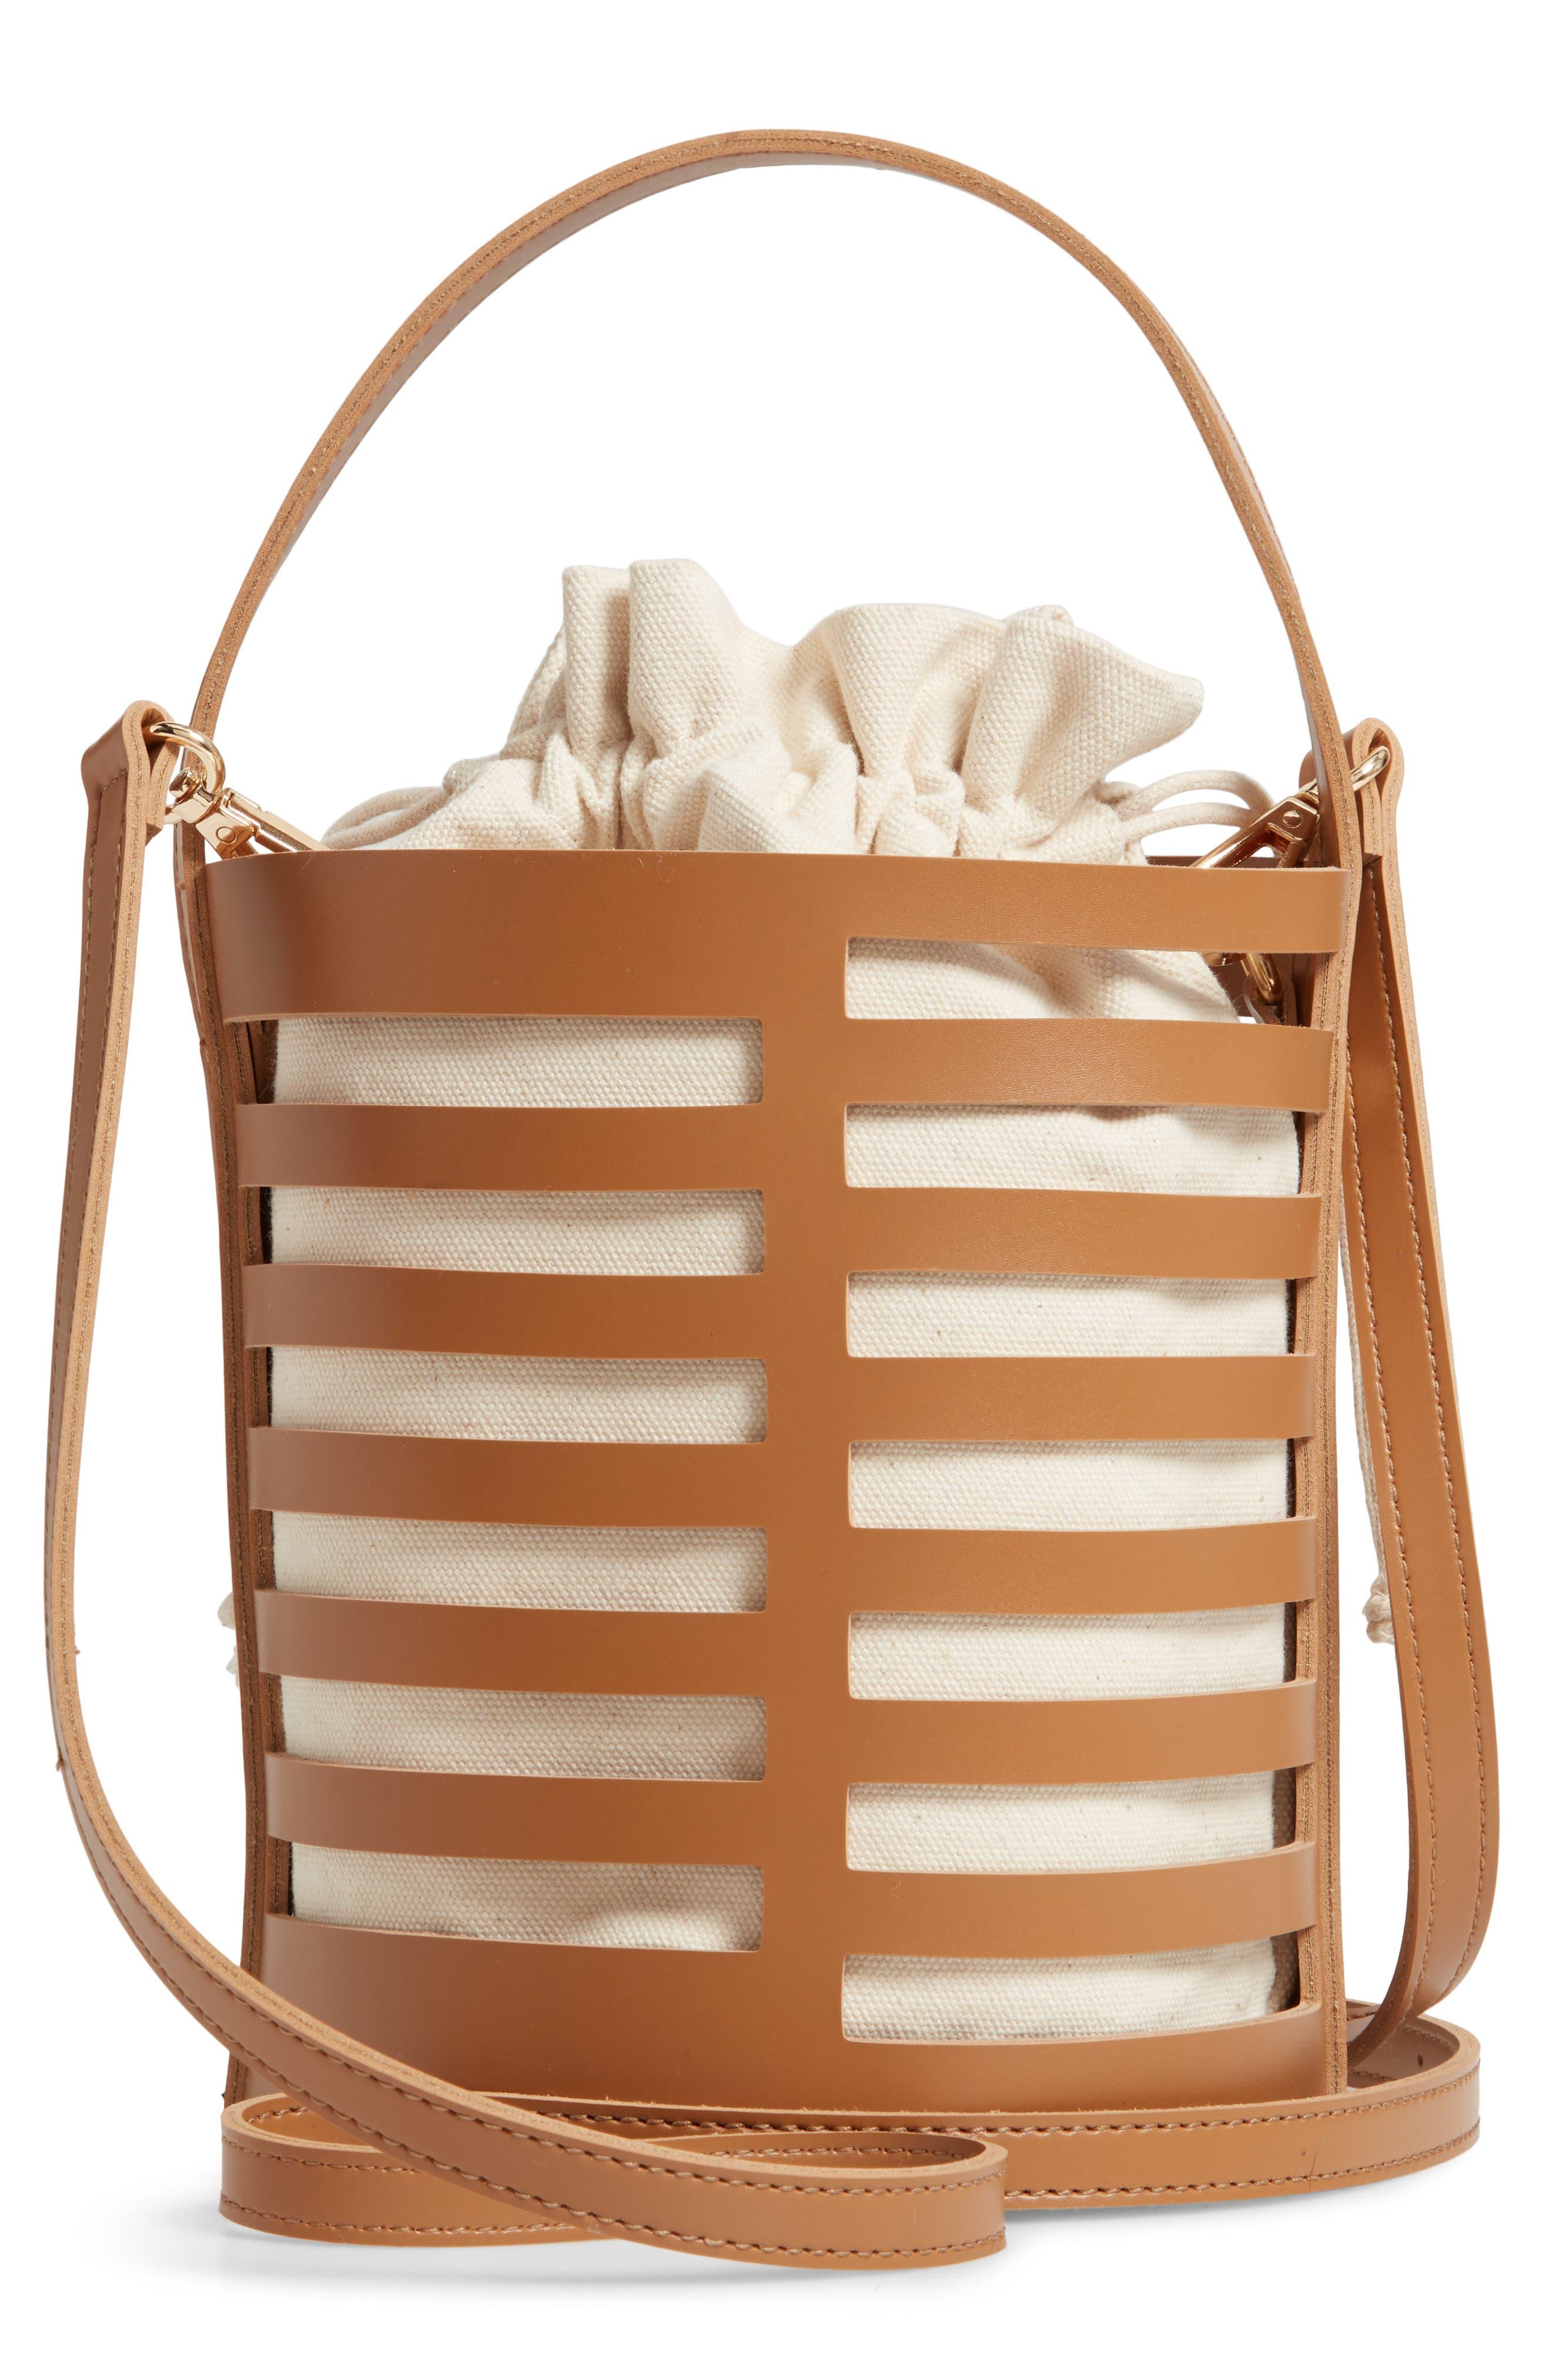 Cutout Round Bucket Crossbody Bag,                             Alternate thumbnail 3, color,                             TAN